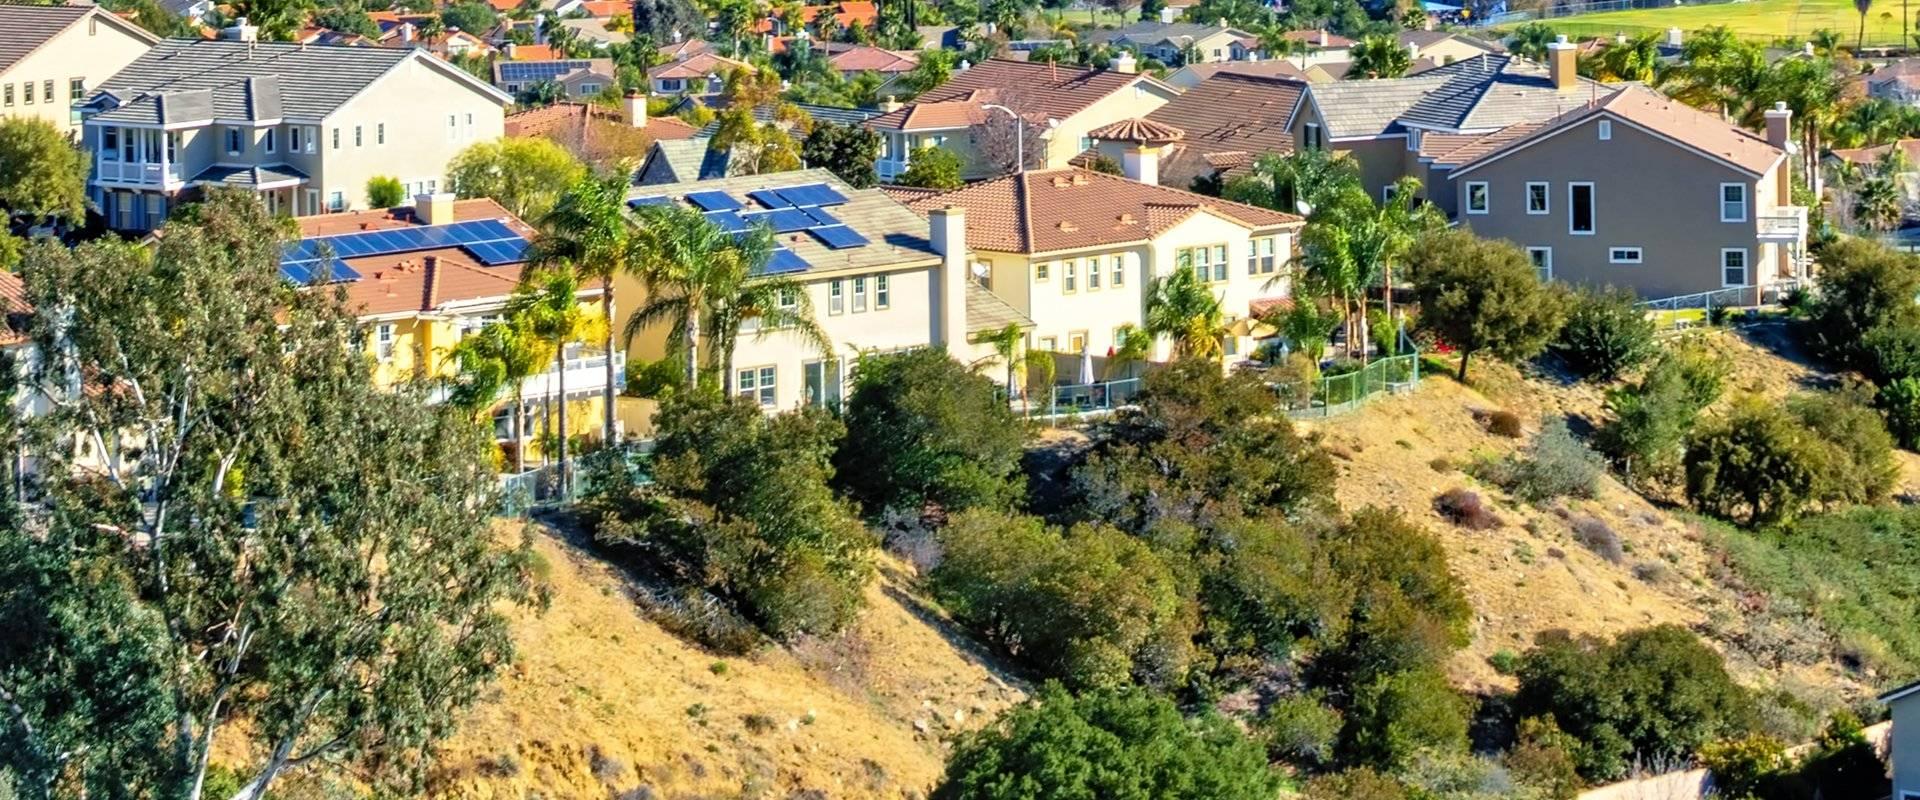 houses in california